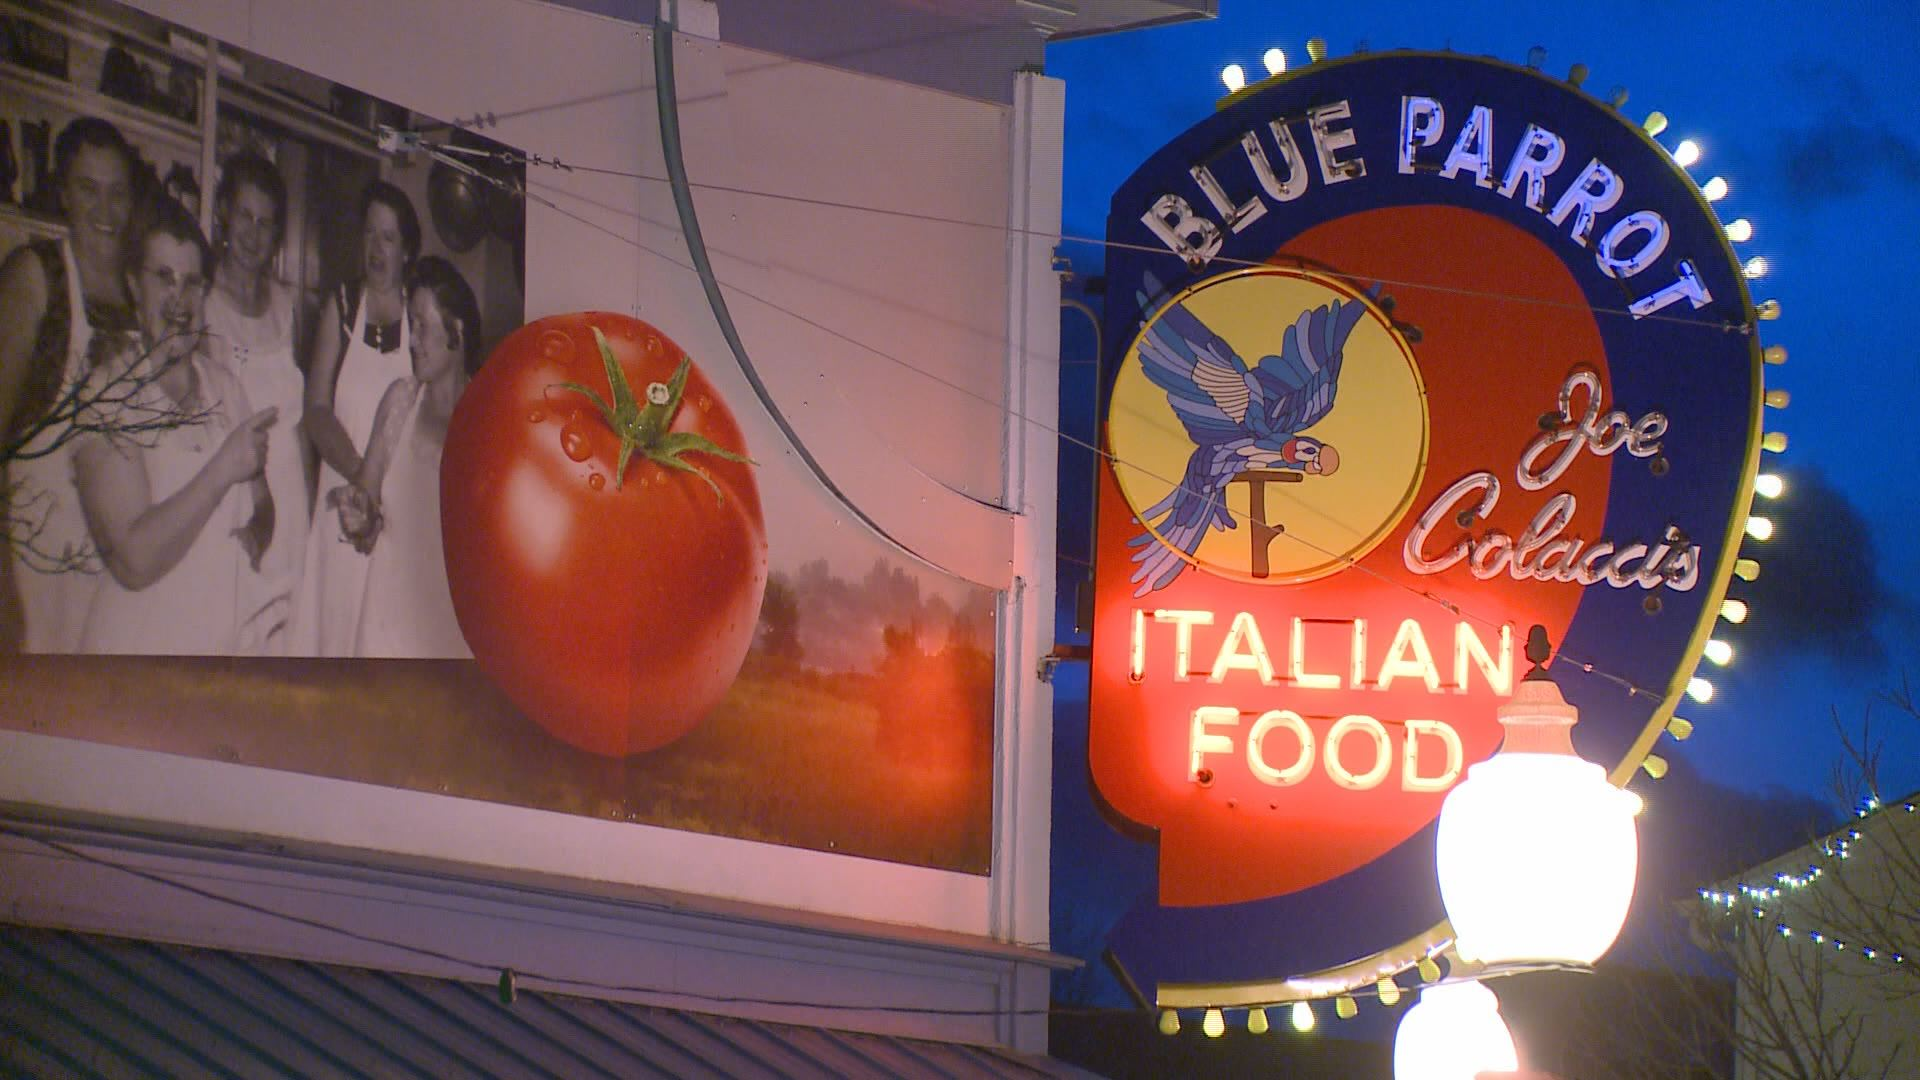 Congratulate, Blue parrot restaurant louisville co you for